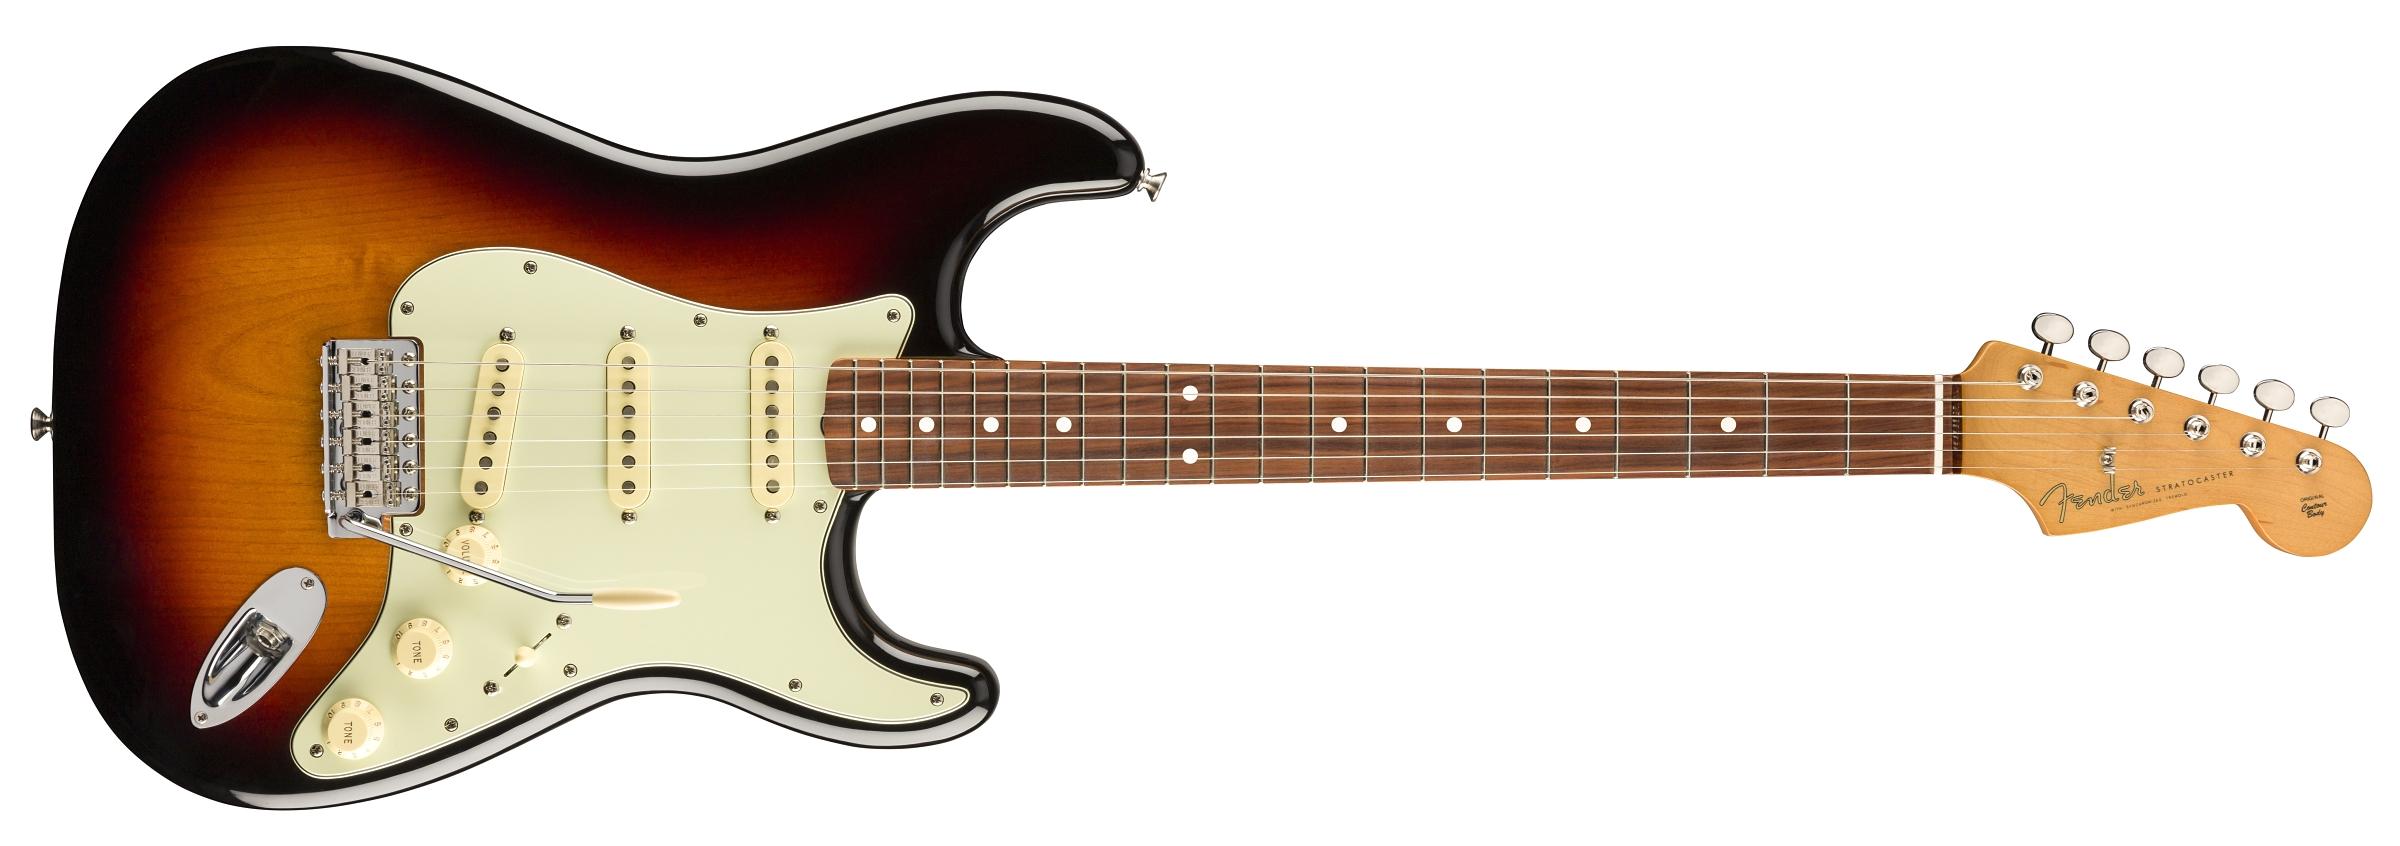 Vintera® '60s Stratocaster®   Electric Guitars